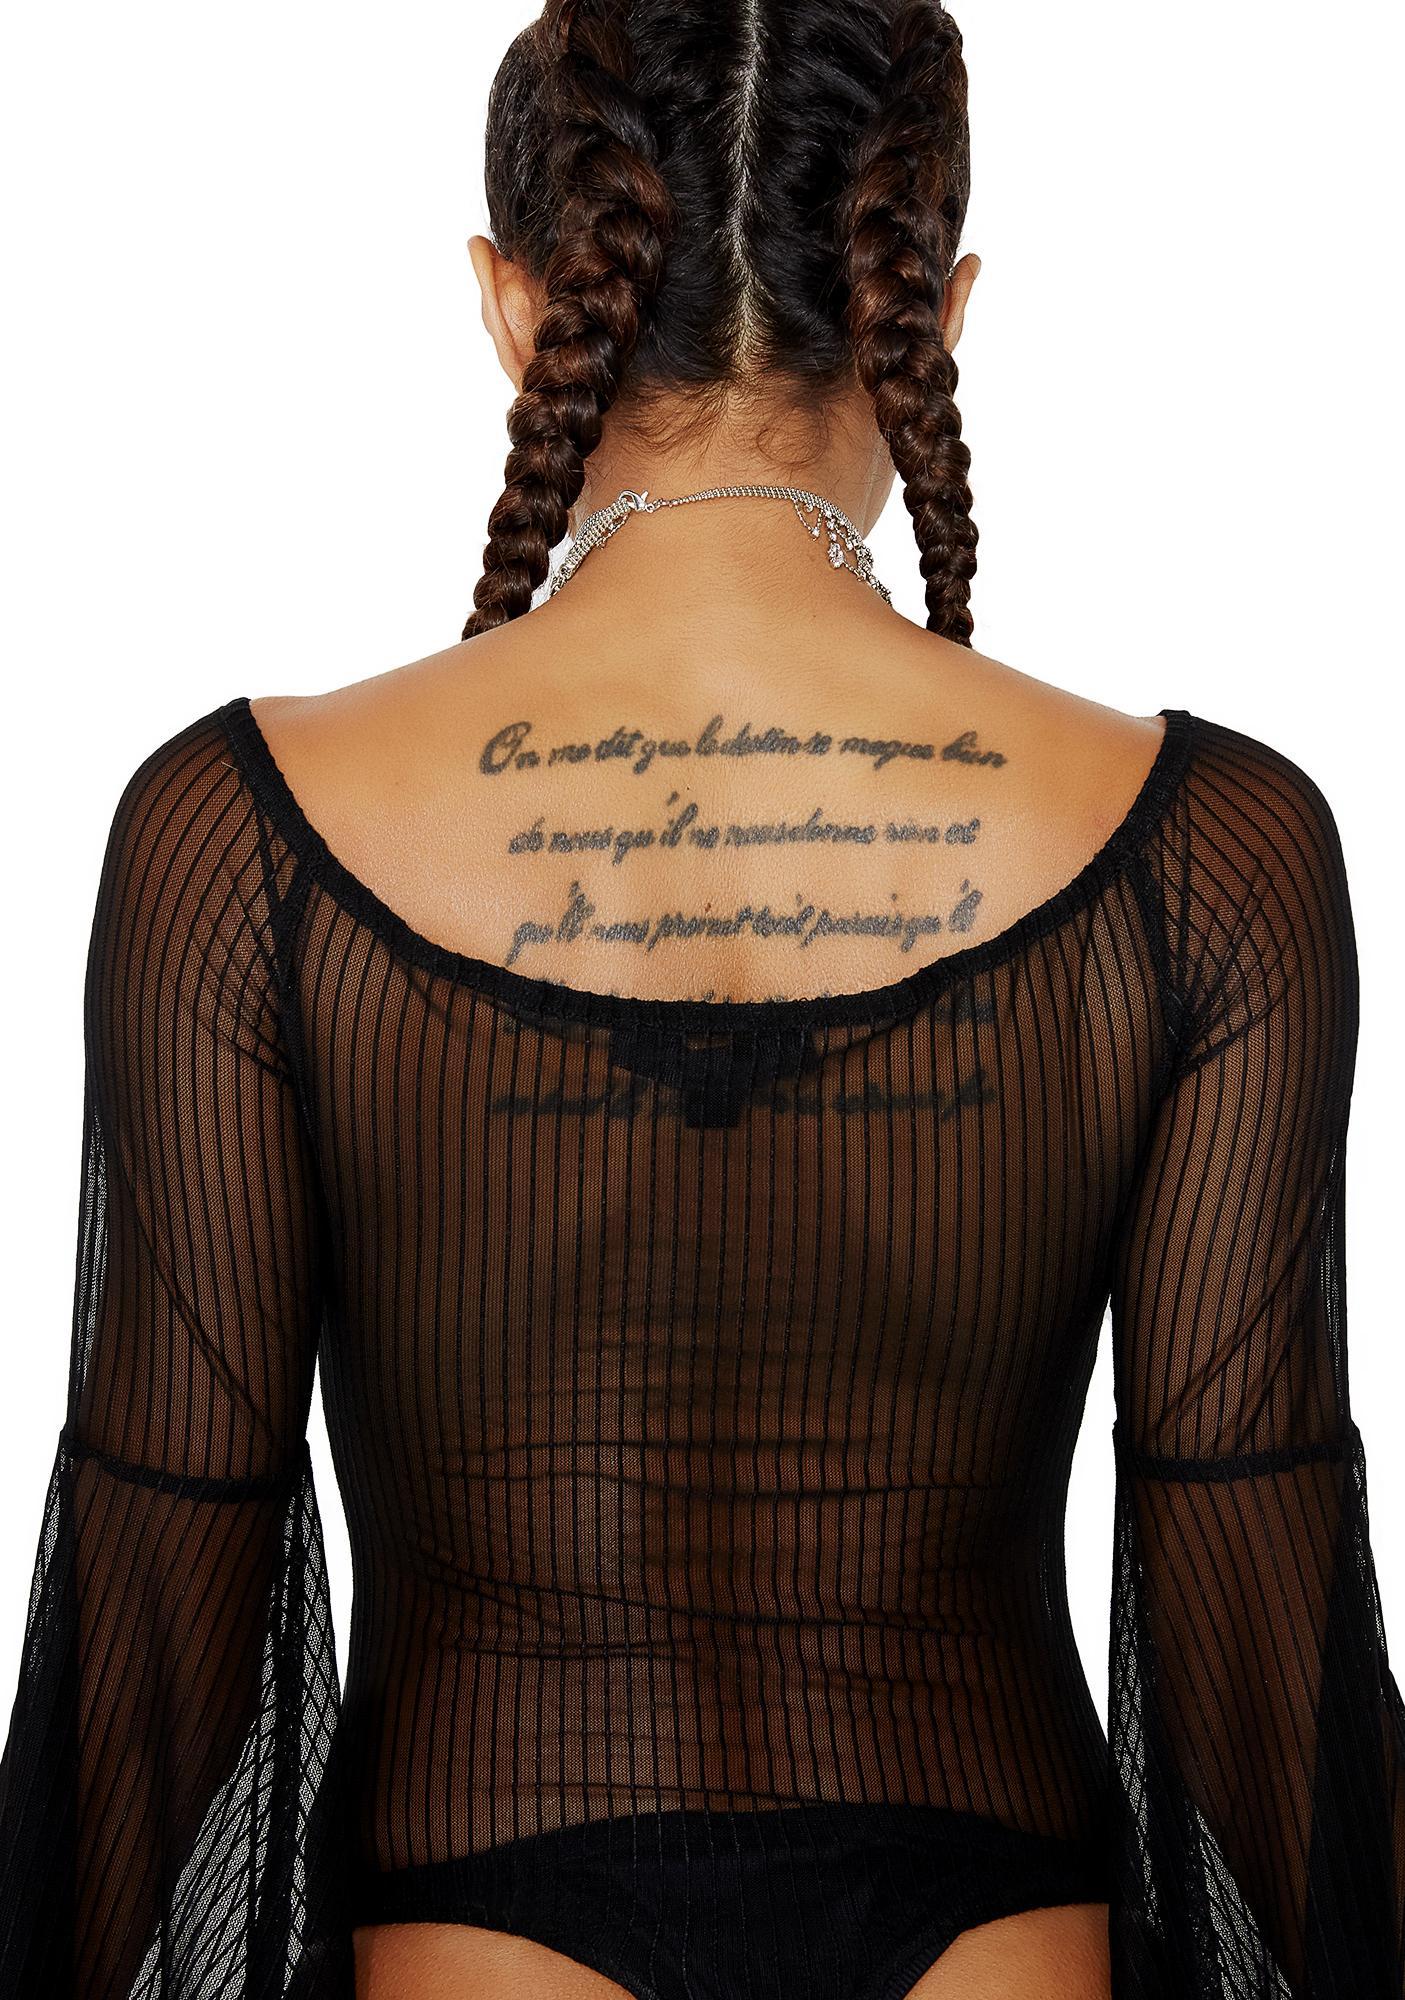 Fine Lines Pinstriped Bodysuit